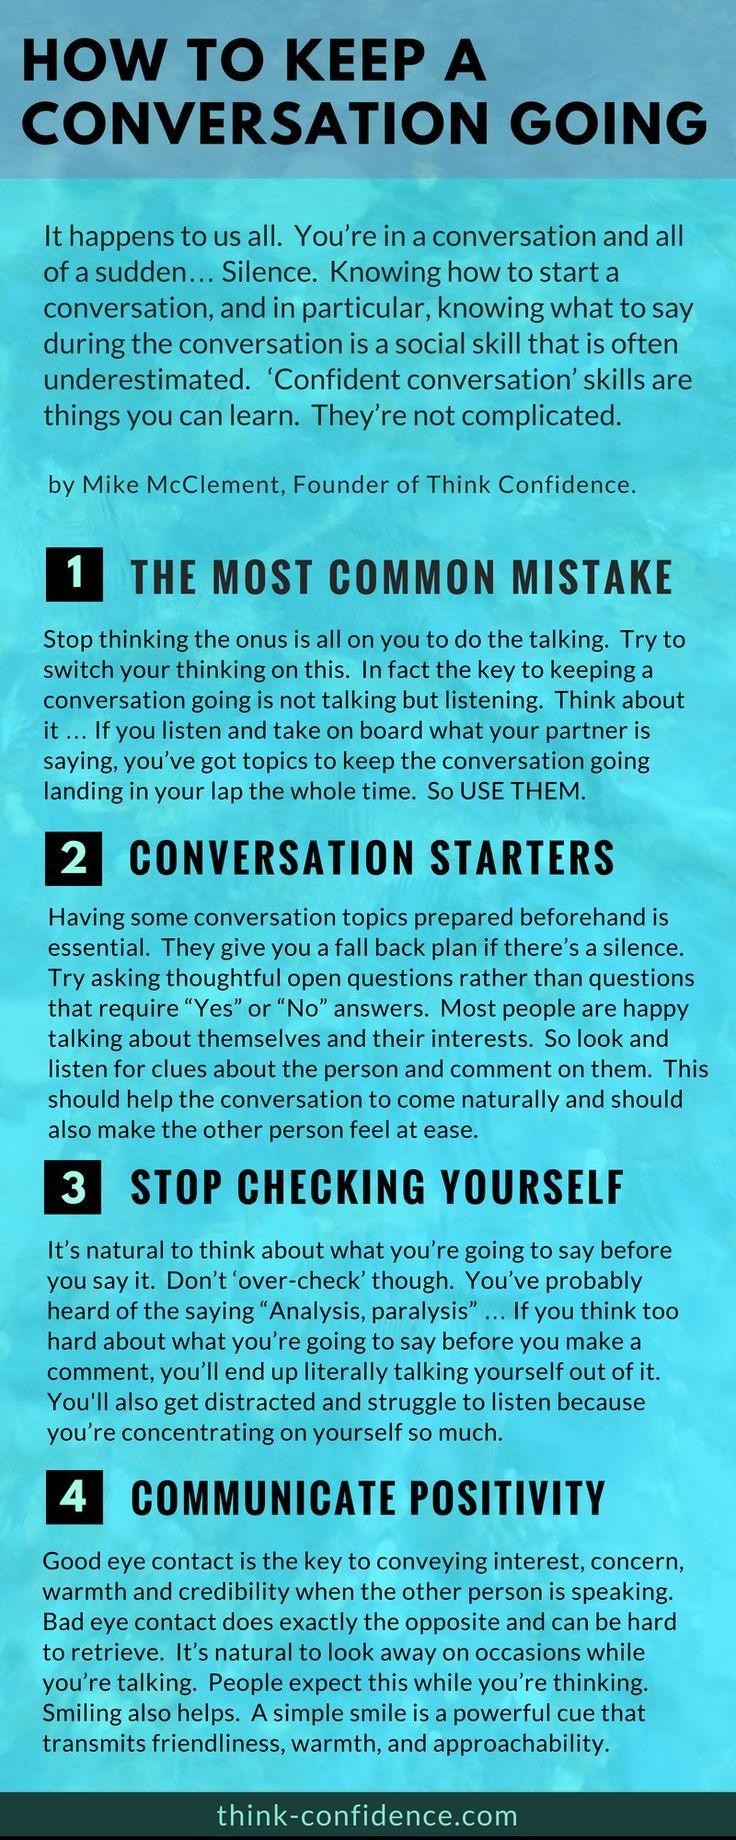 ways to keep conversation going